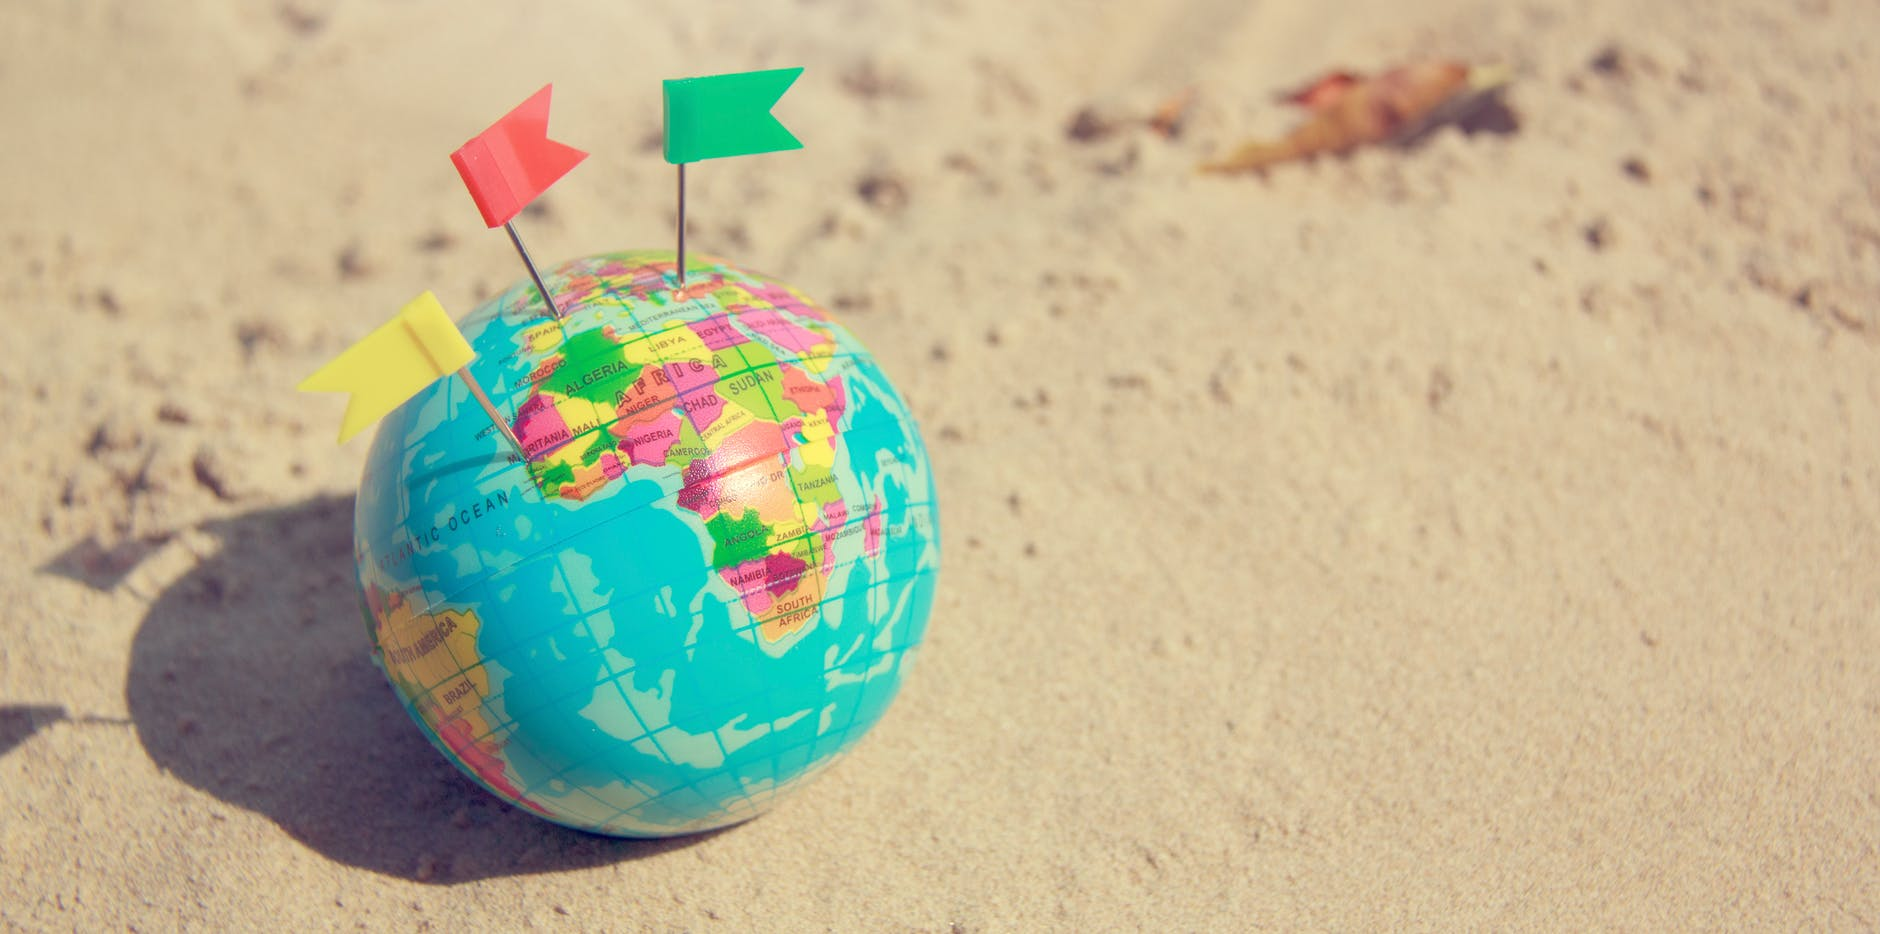 globe on sand